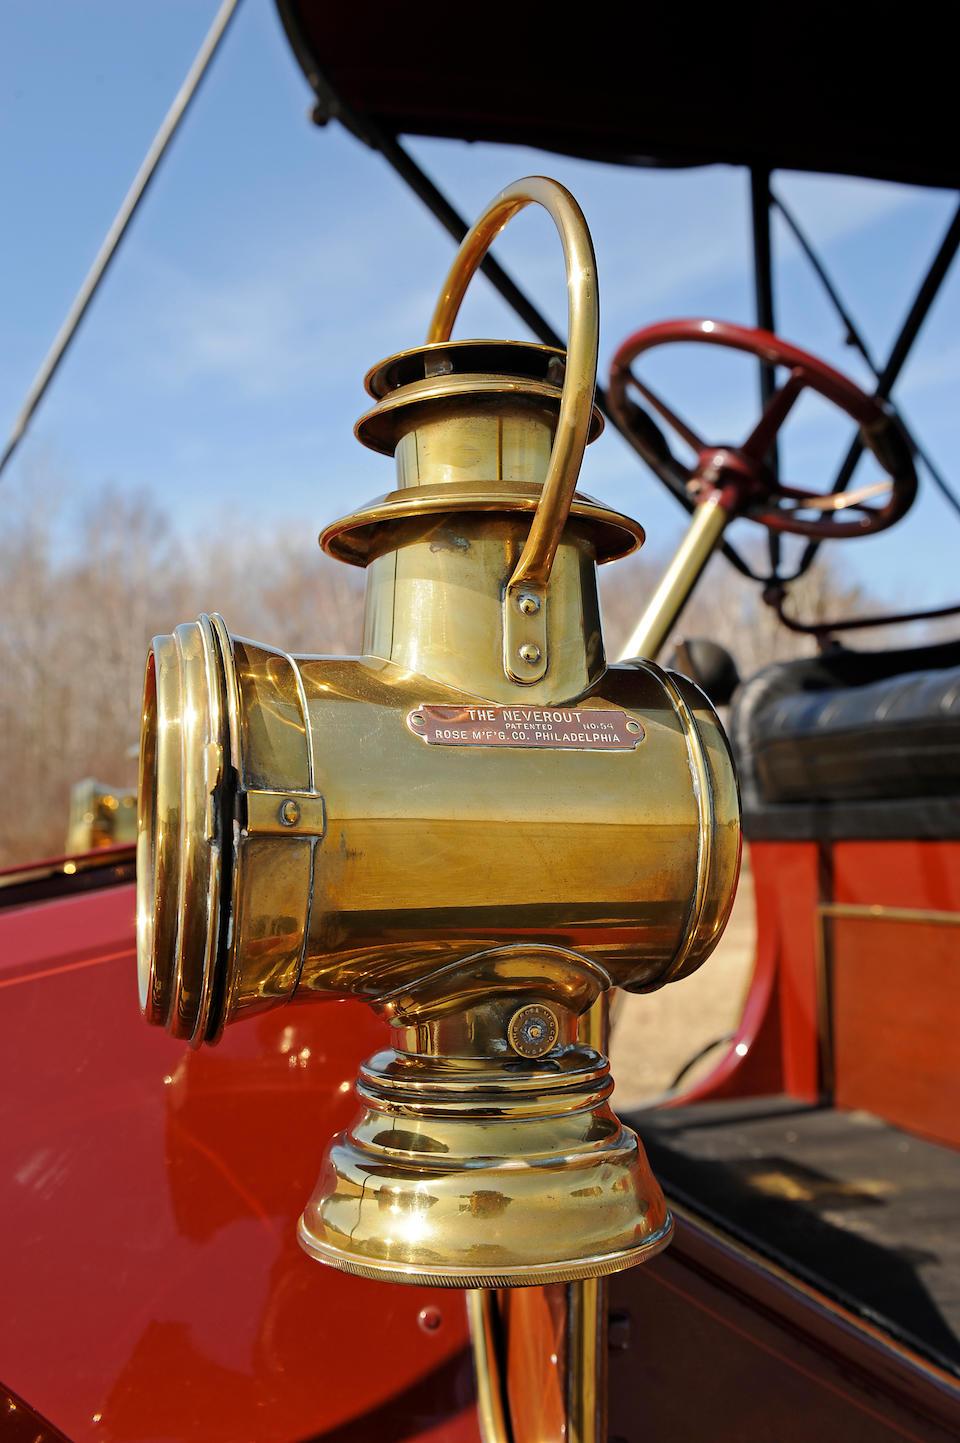 Ex-Dr. Samuel L. Scher,1906 Autocar Type 10 Runabout  Chassis no. 7962 Engine no. 7978